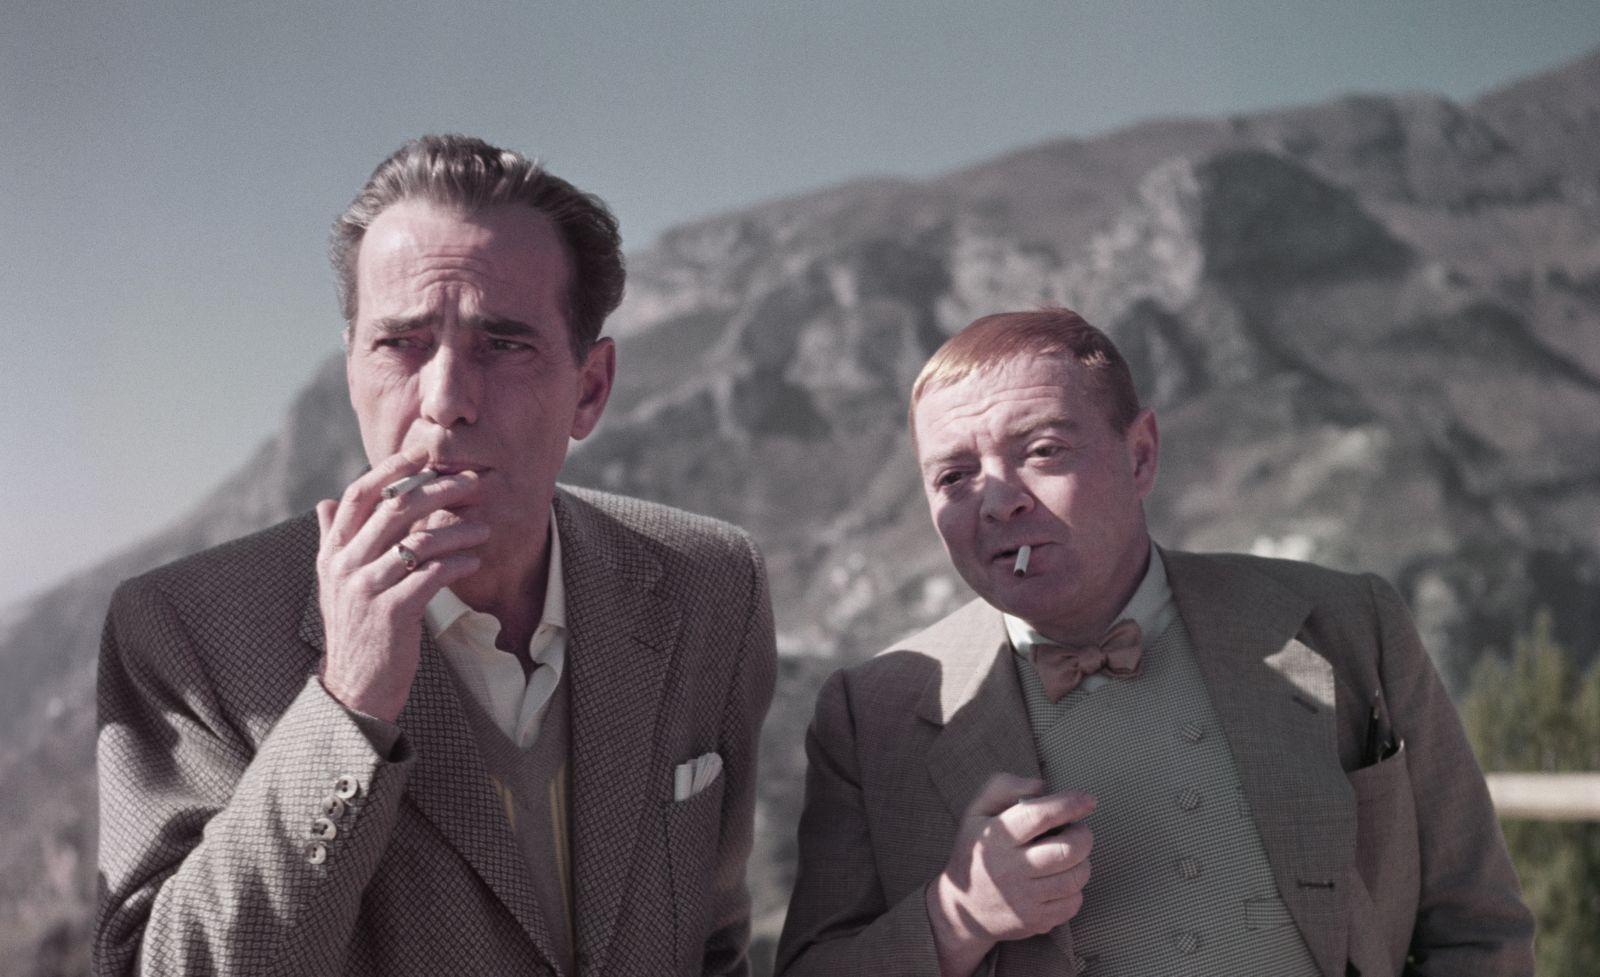 Humphrey Bogart e Peter Lorre sul set di Il Tesoro dell_Africa_Aprile 1953_Credits Robert Capa International Center of Photography Magnum Photos